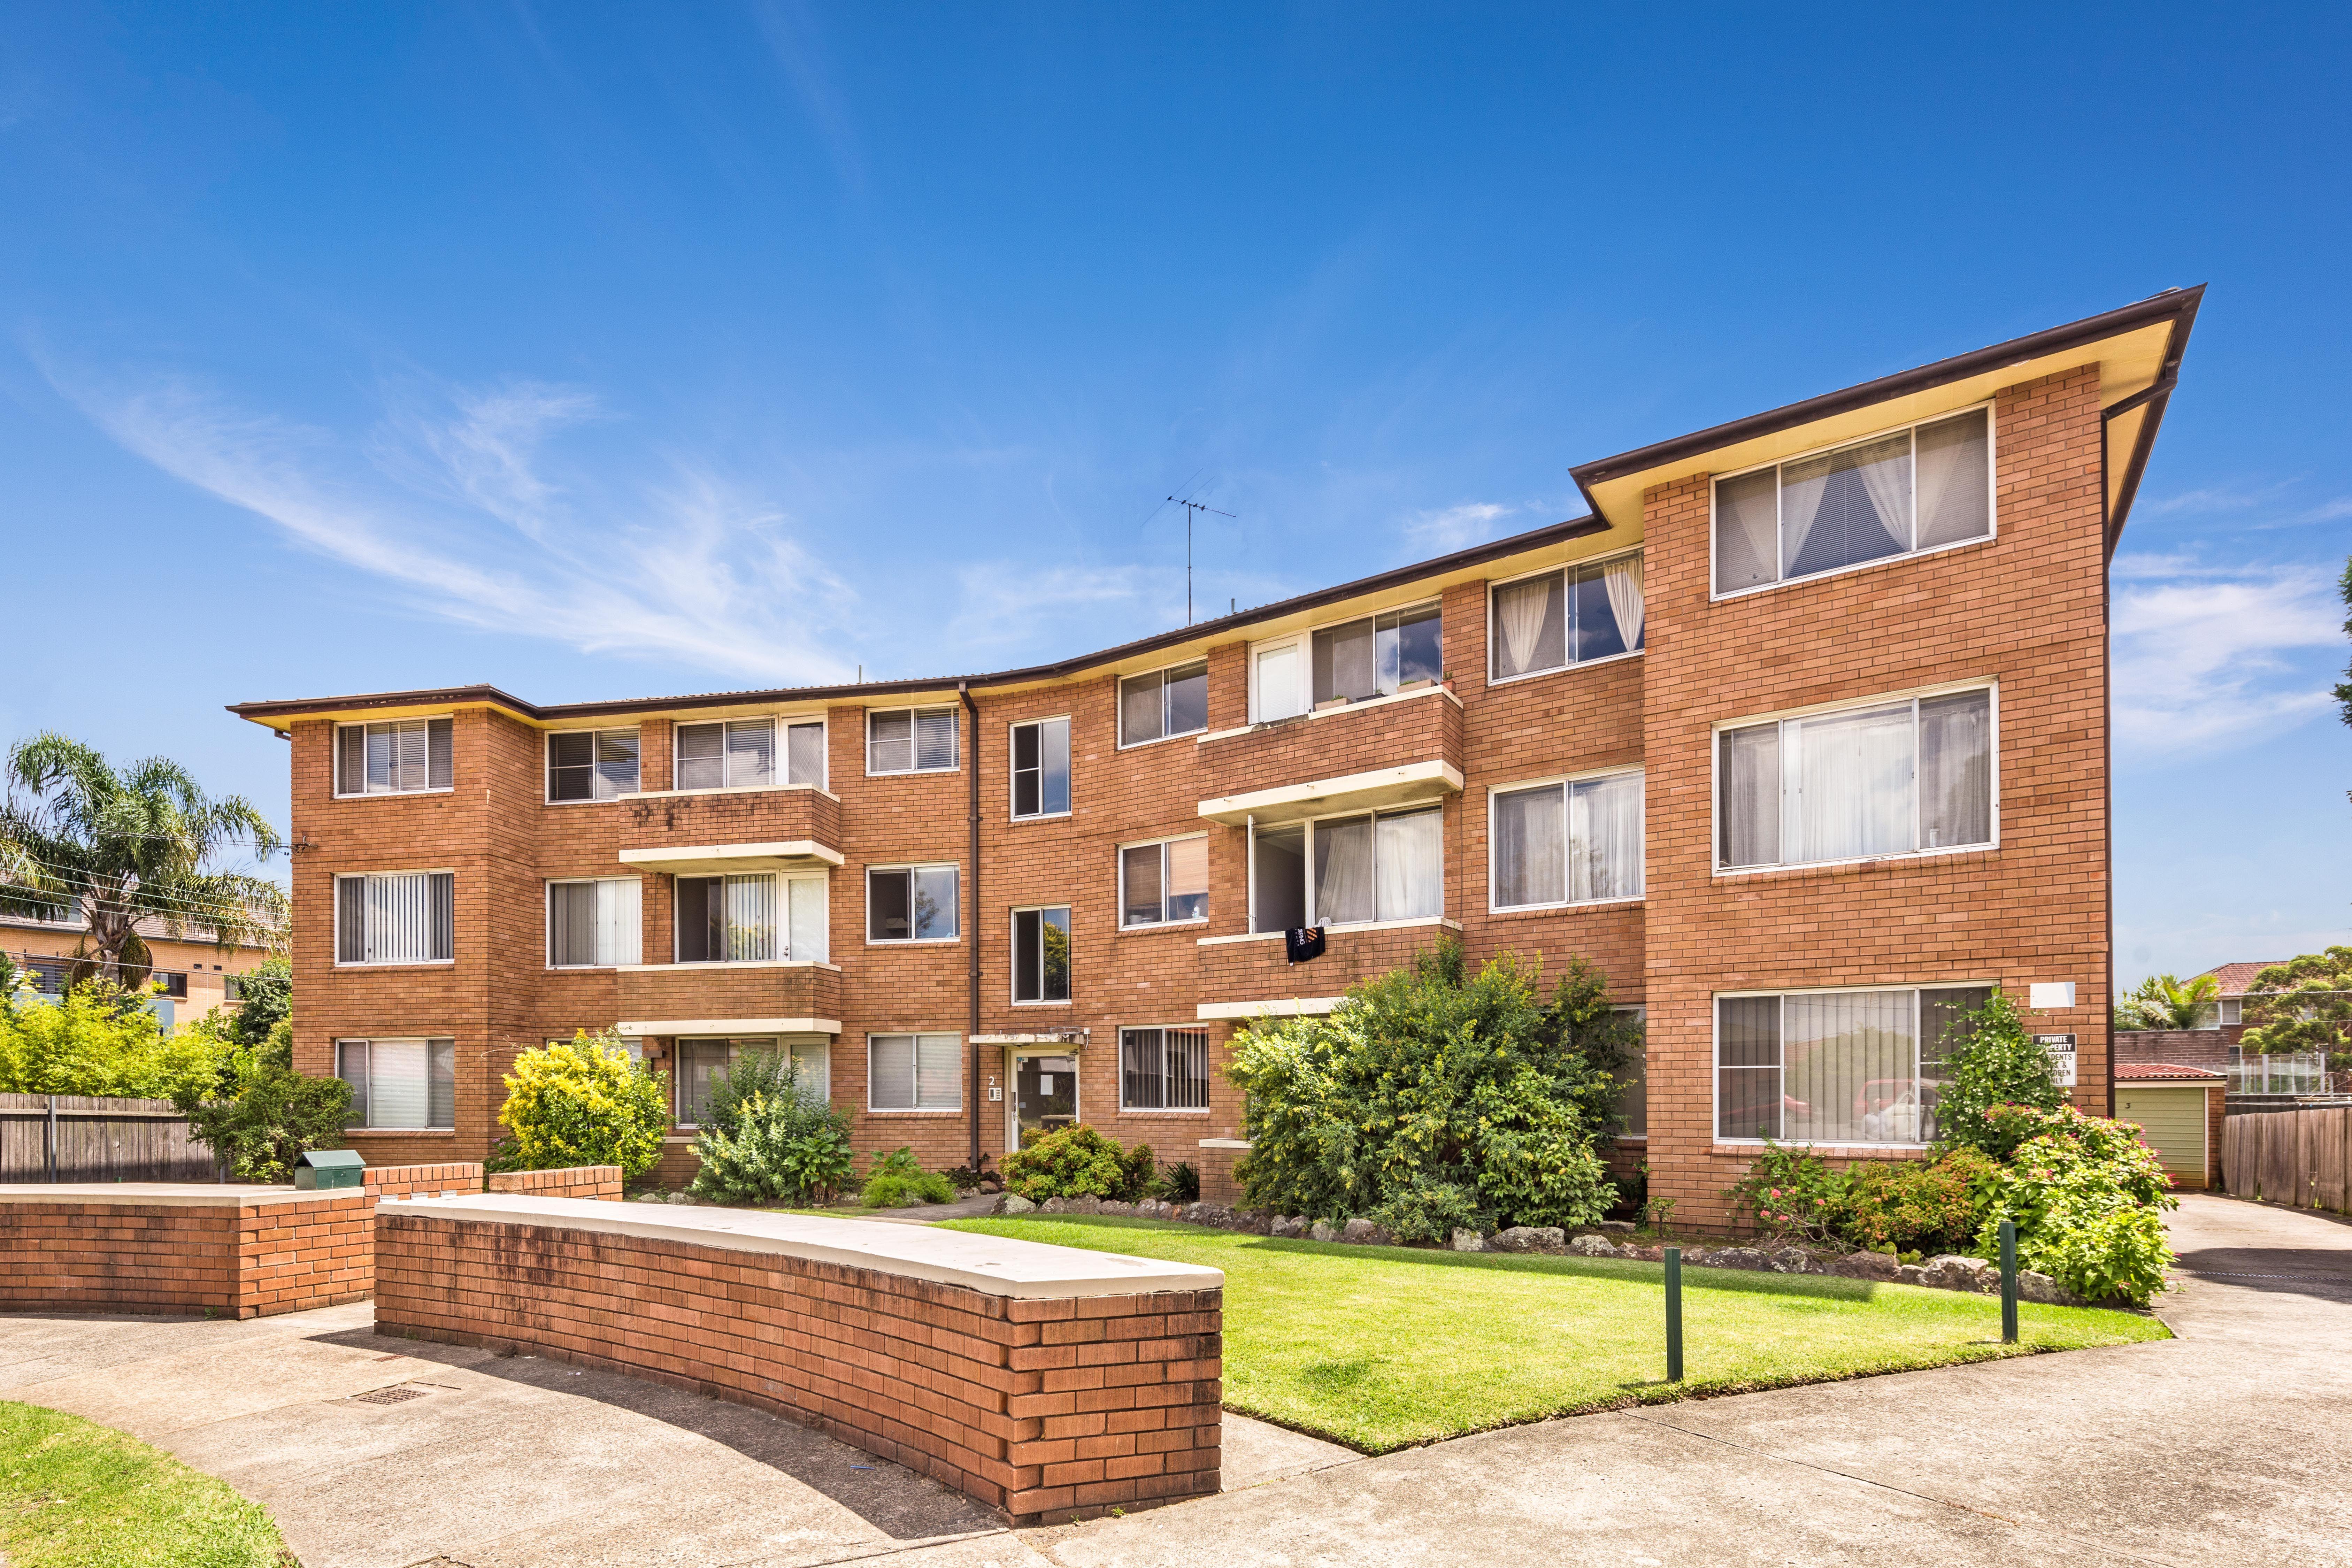 10/2 Mooney Street, Strathfield South NSW 2136